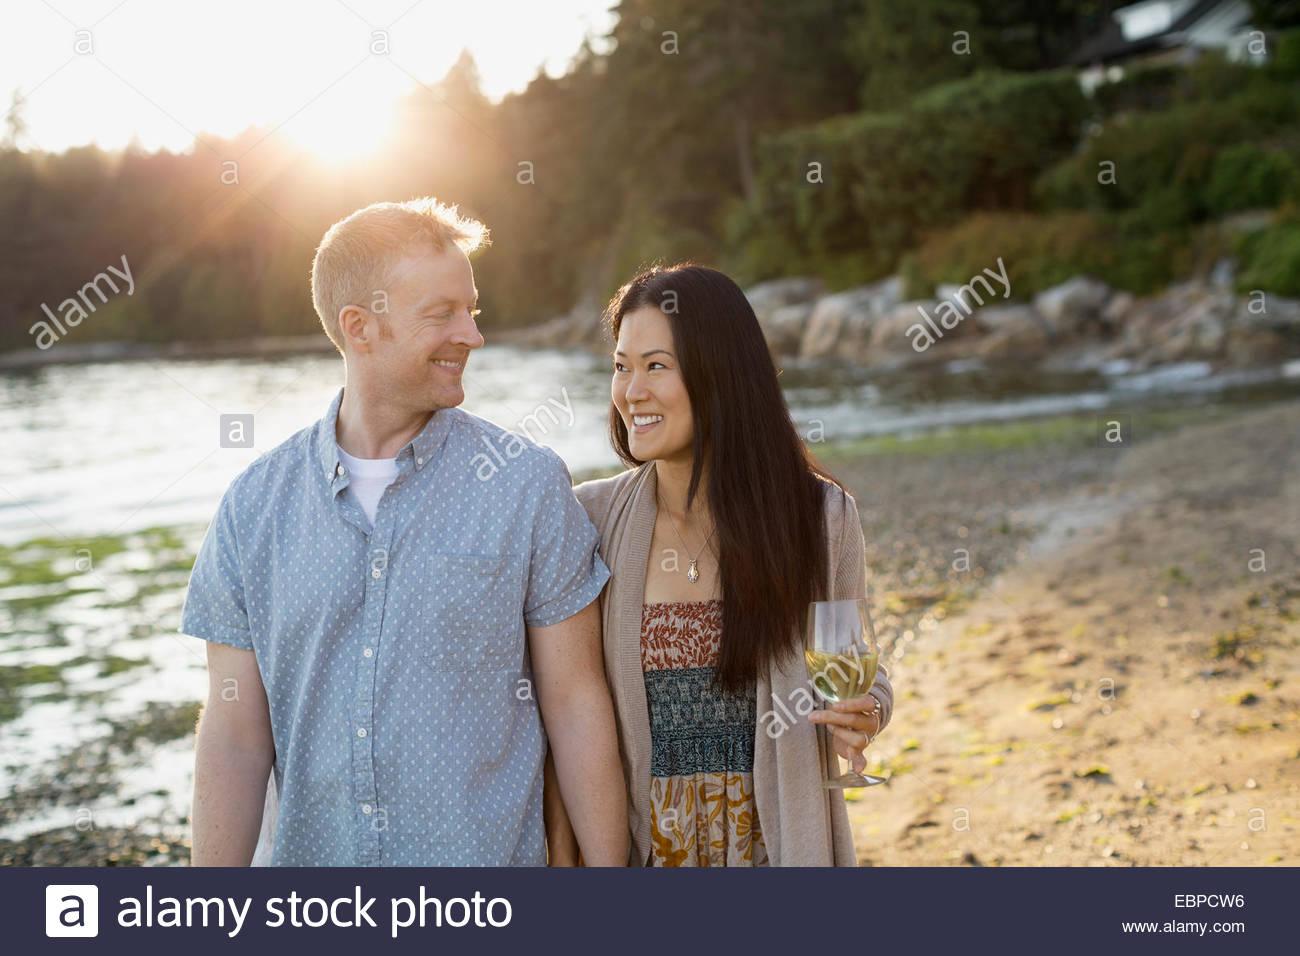 Smiling couple walking on beach - Stock Image